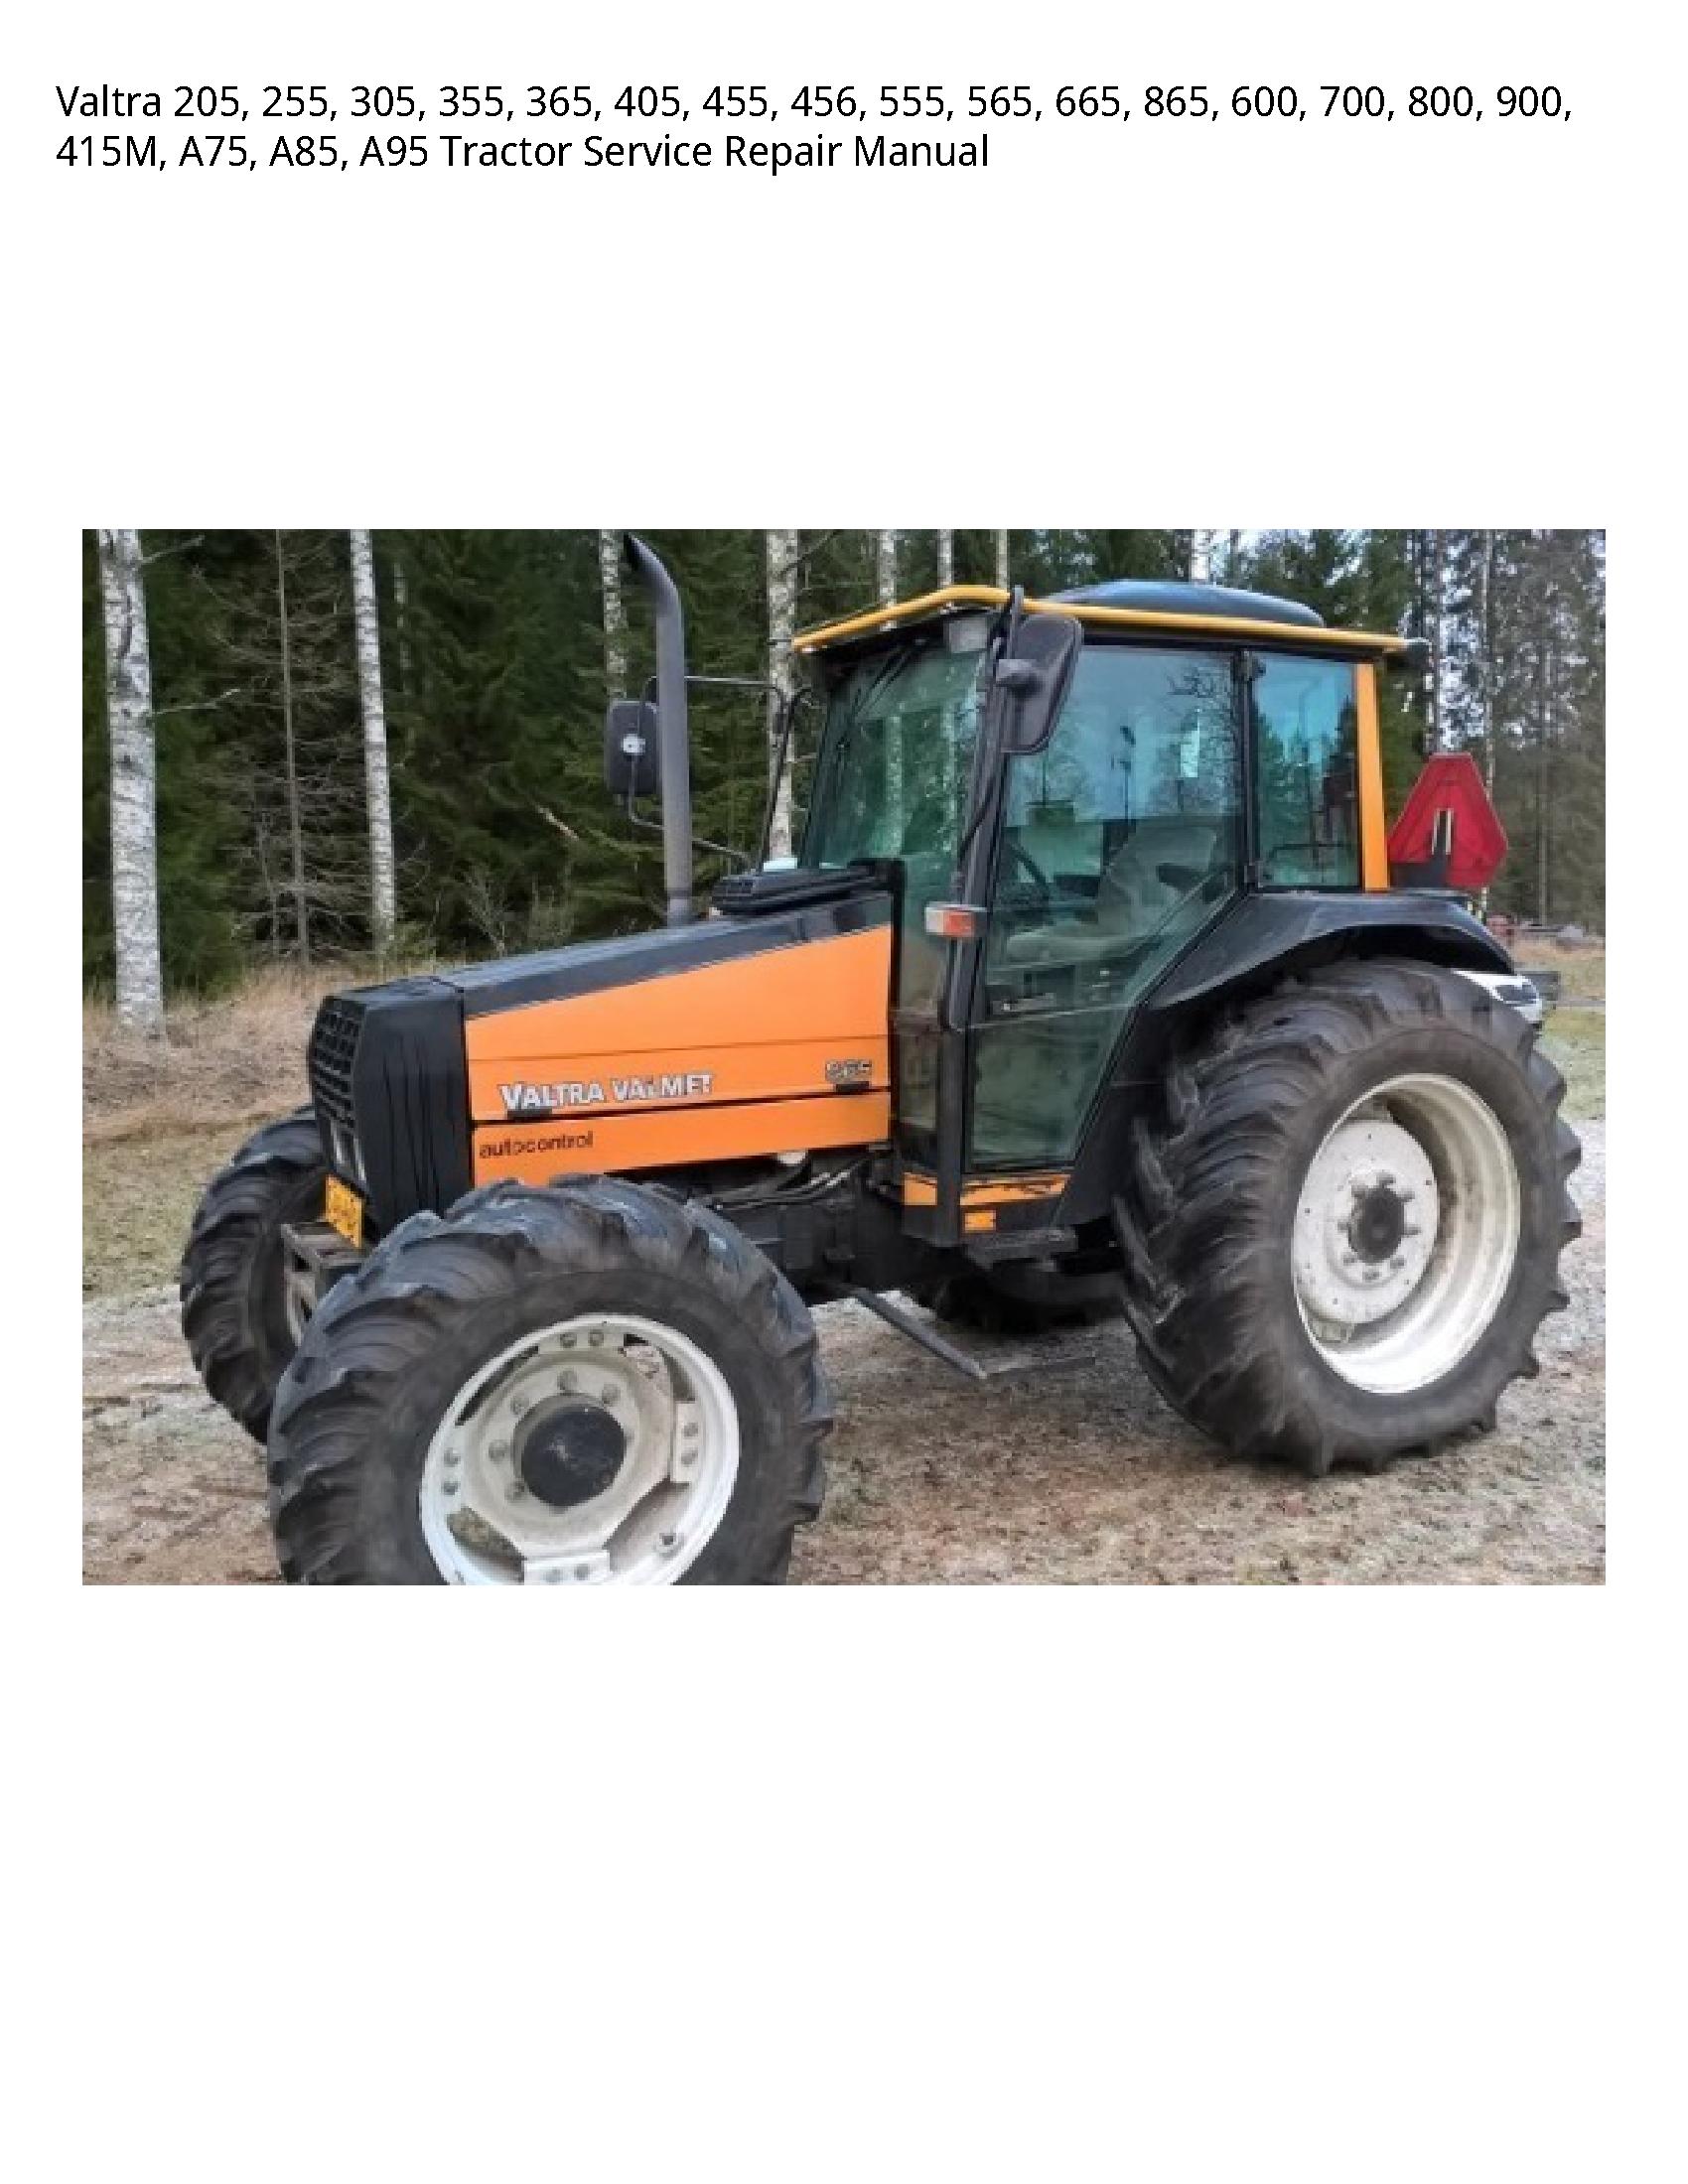 Valtra 205 Tractor manual